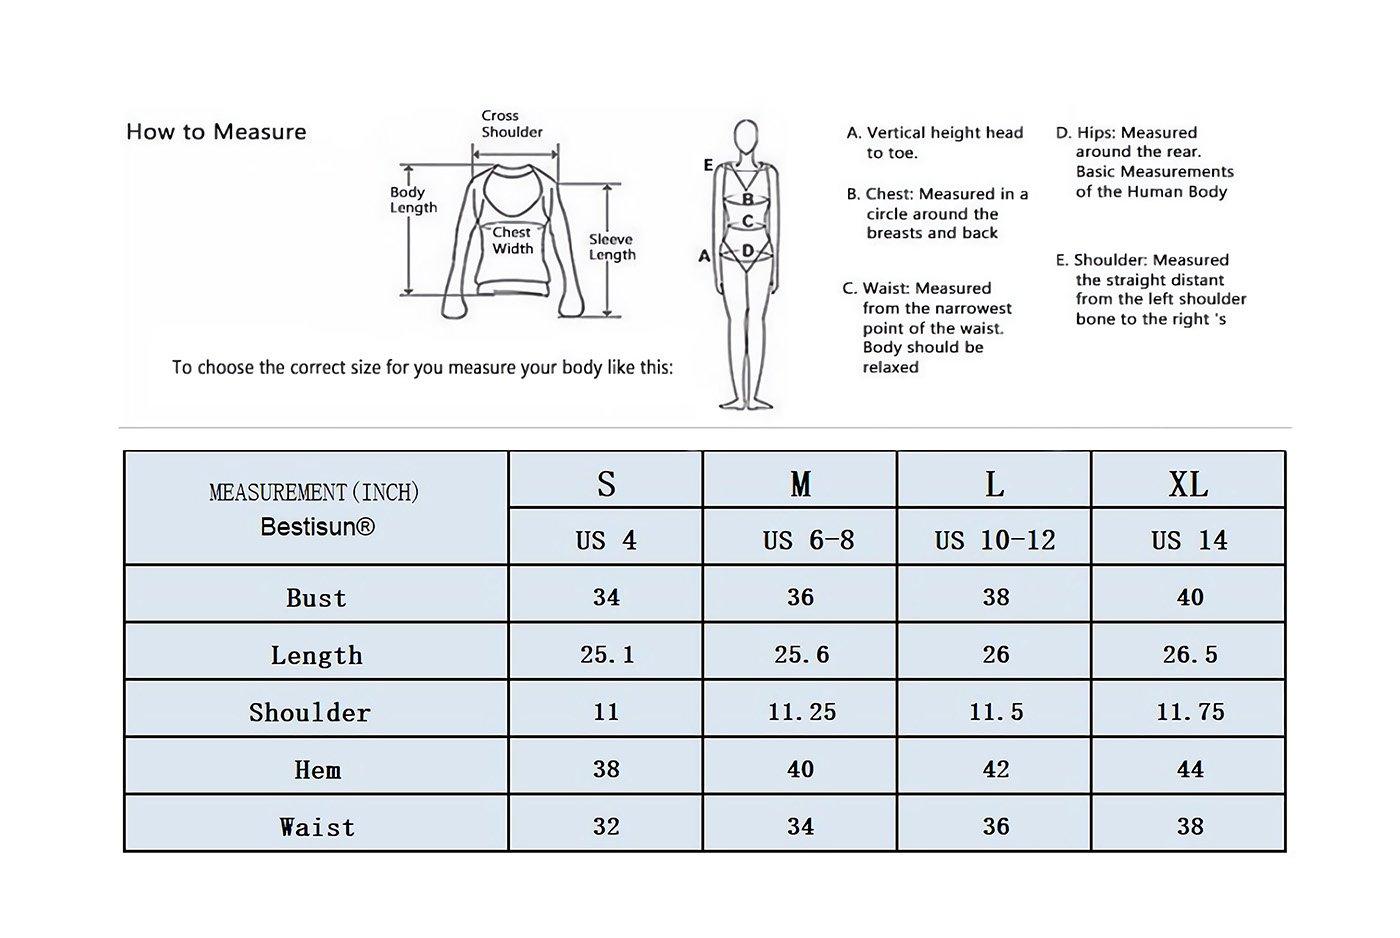 Bestisun Women's Yoga Tank Top Workout Sport Shirt Racerback T-Shirt Top Wine Red M by Bestisun (Image #3)